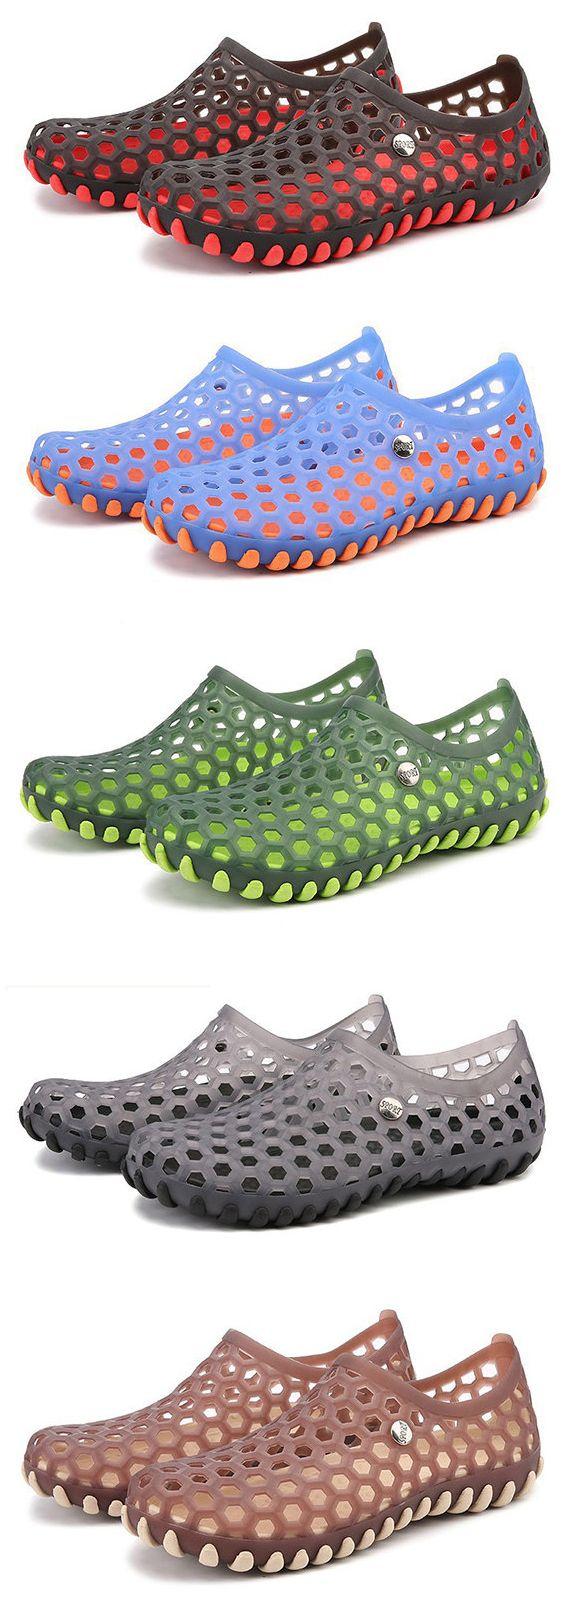 Women's sandals with removable insoles - Men Soft Massage Removable Insole Beach Sandals Casual Water Shoes